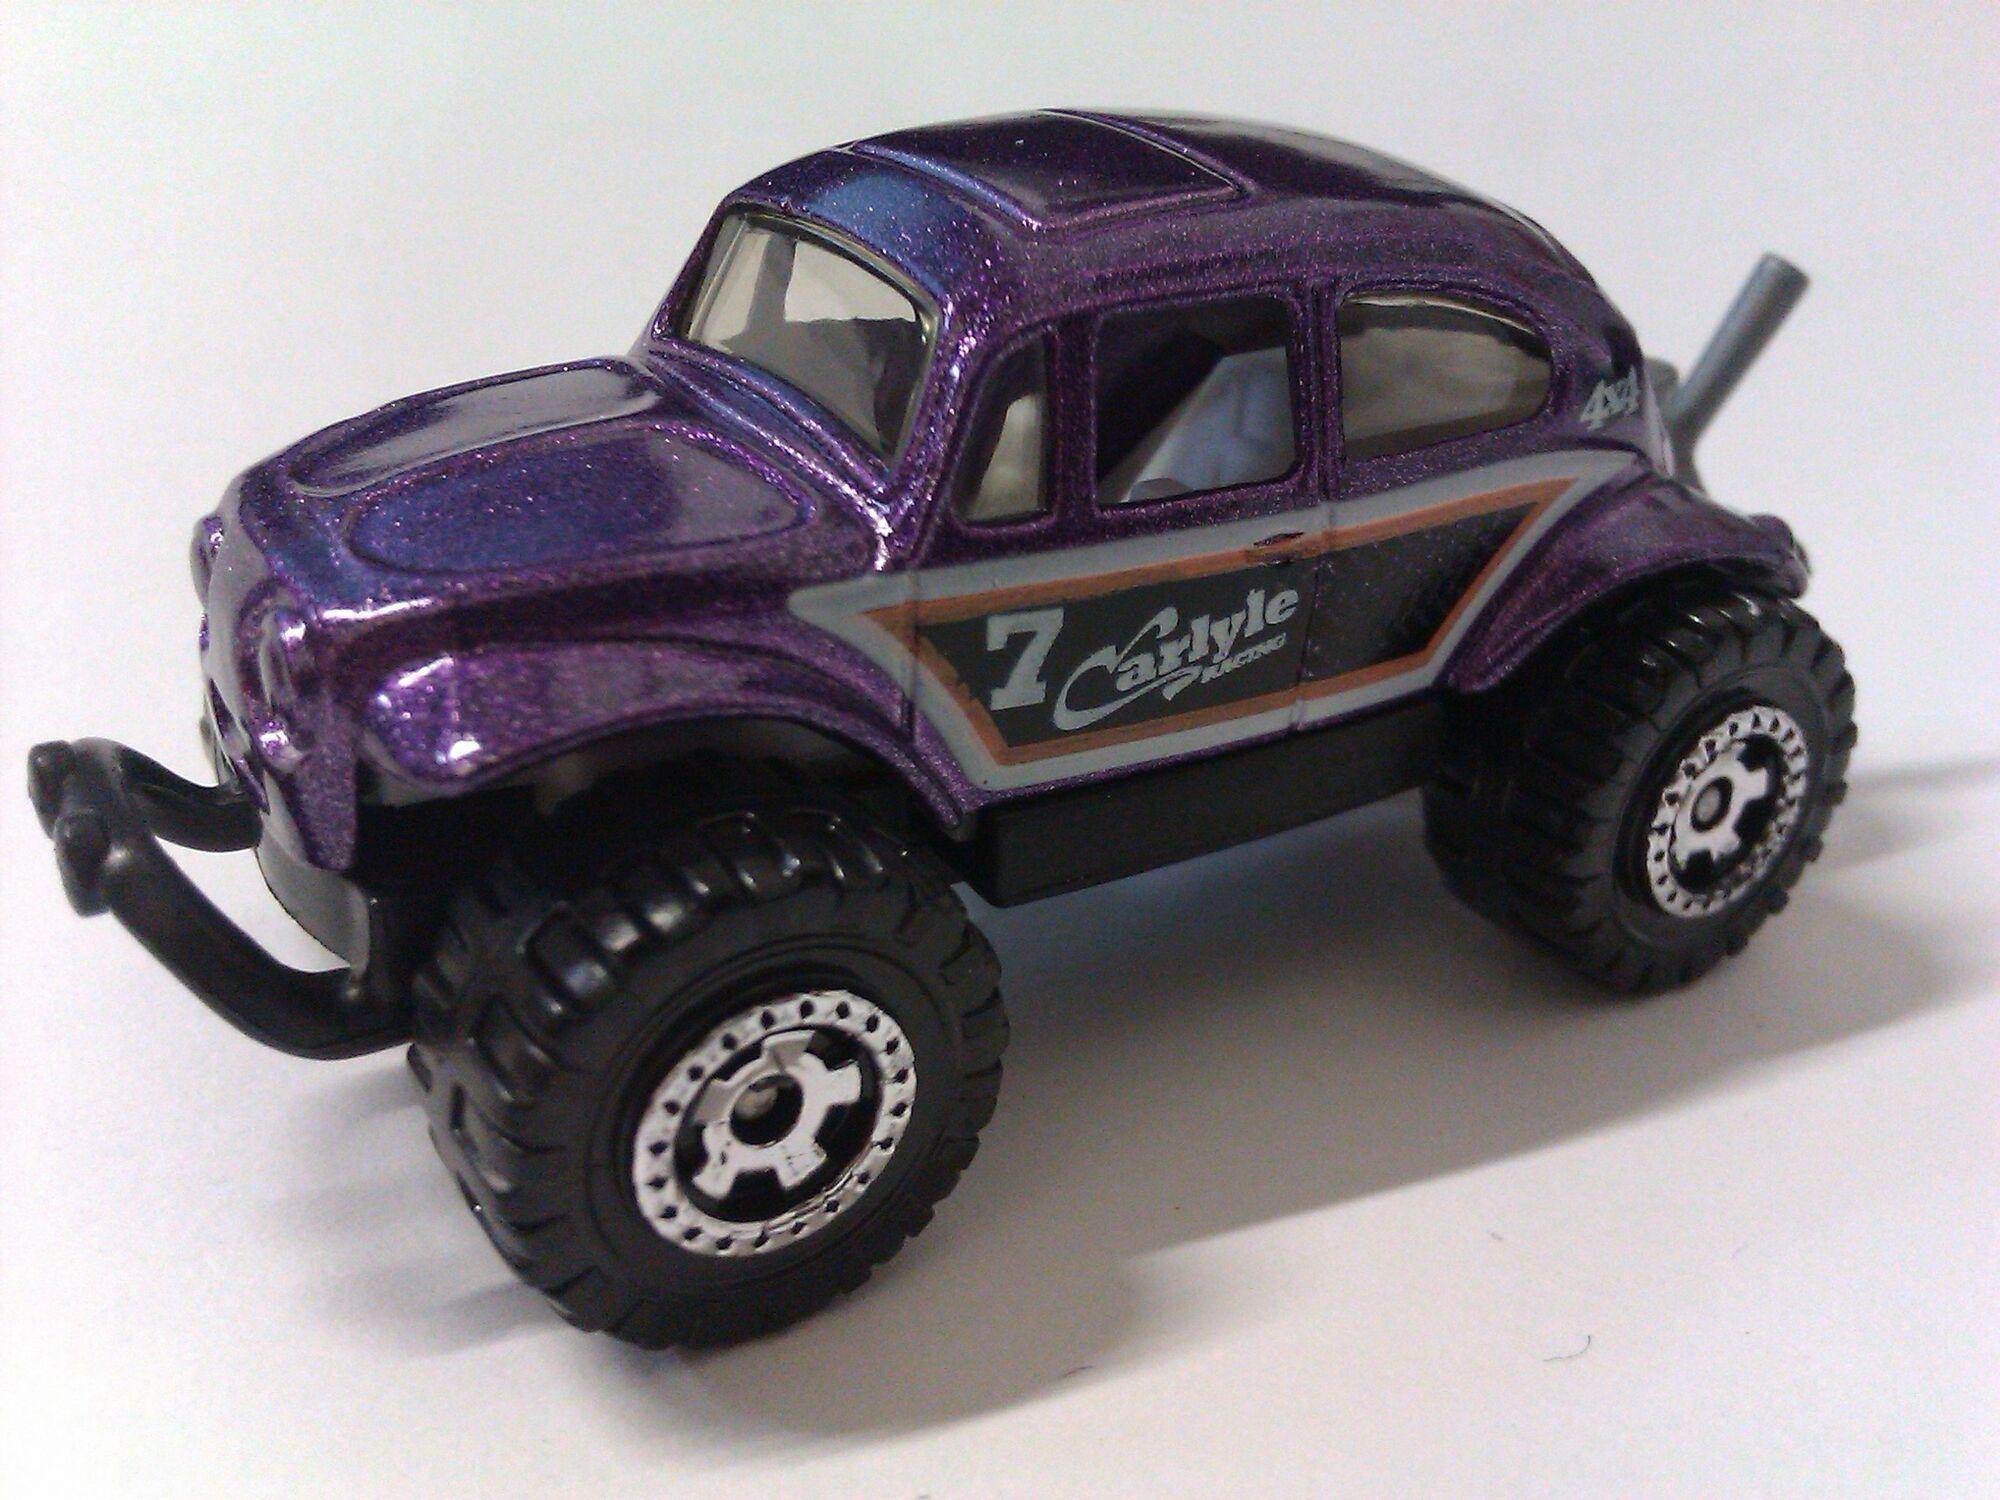 Volkswagen Beetle 4x4 (2006)   Matchbox Cars Wiki   Fandom powered by ...